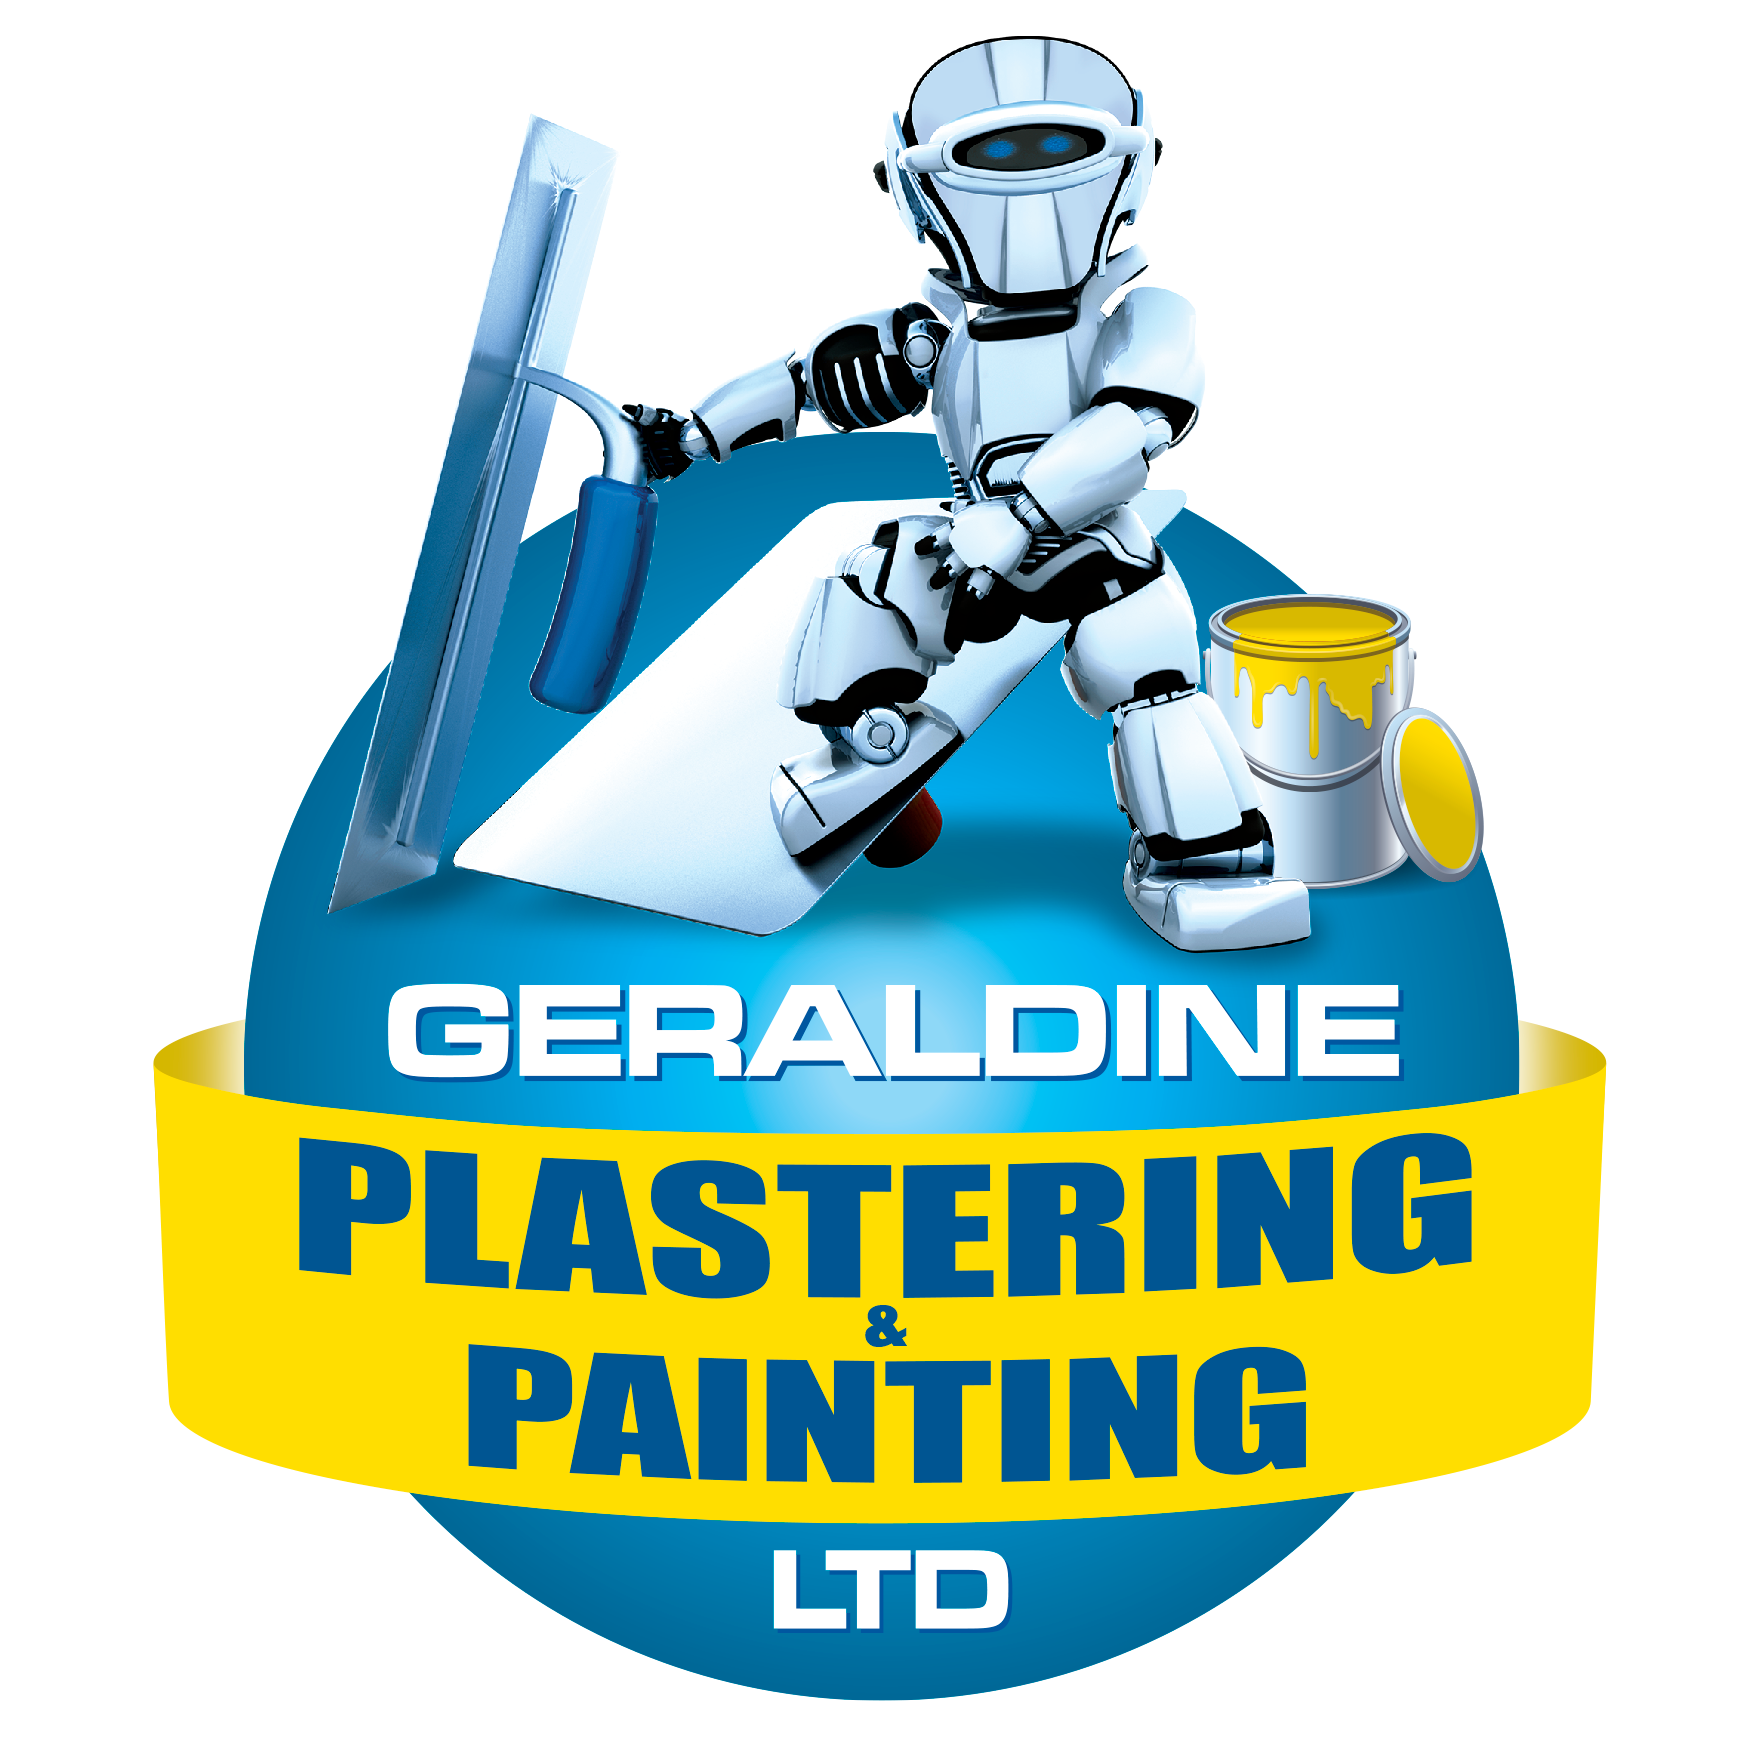 Geraldine Plastering and Painting Ltd